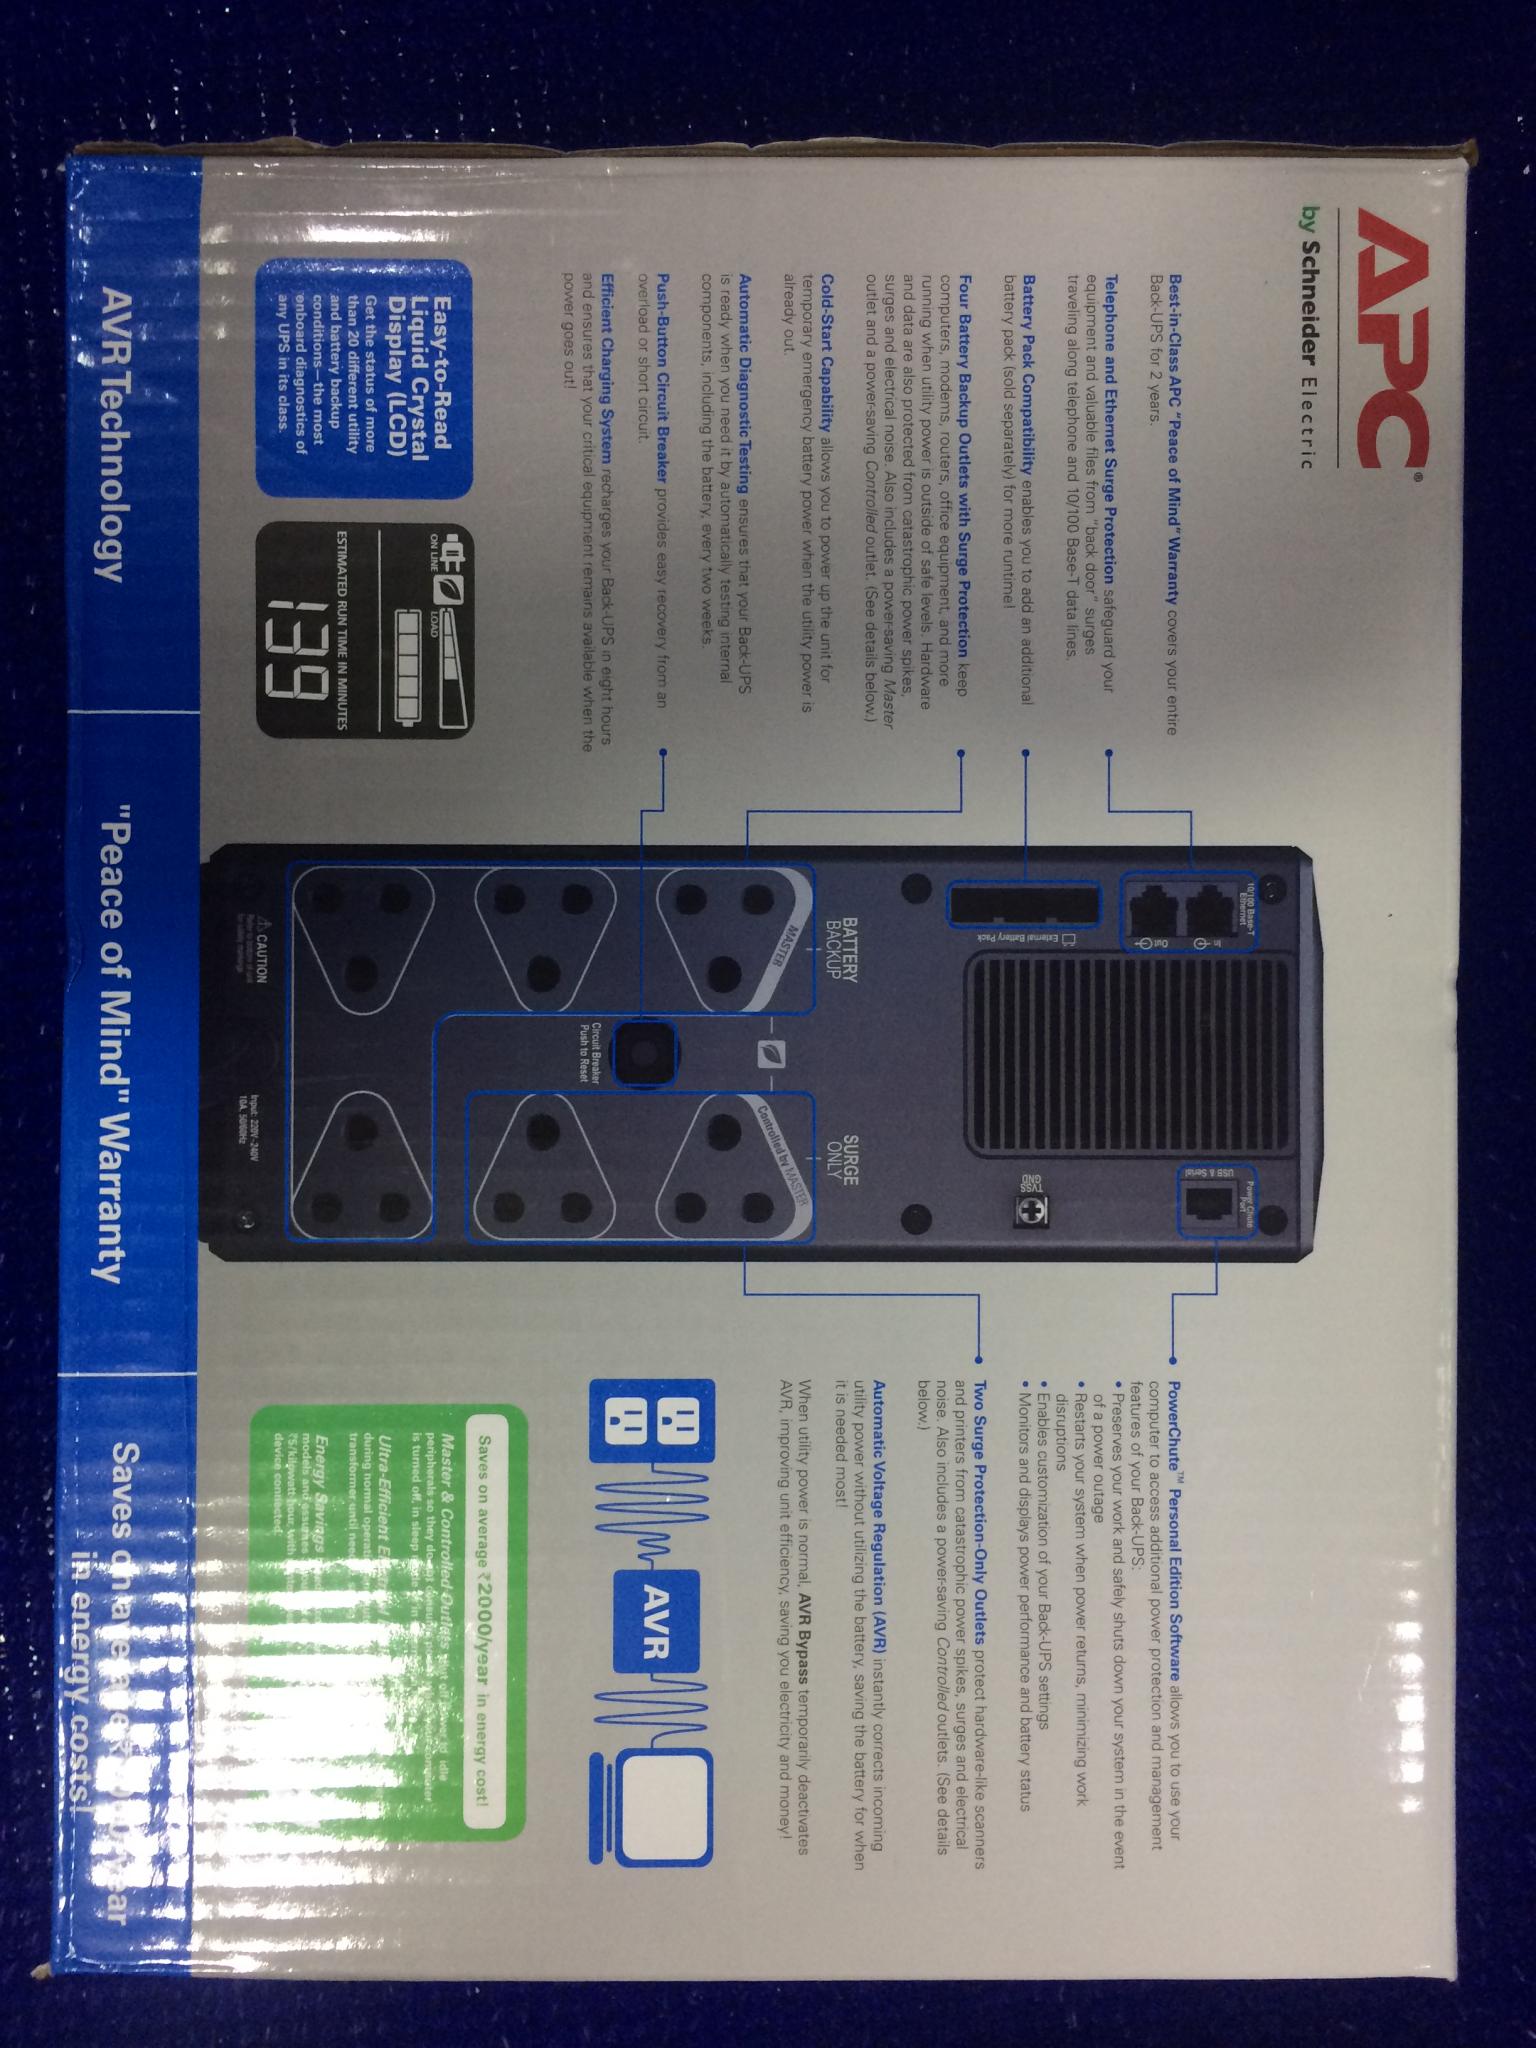 APC BR1000G-IN 1KVA Battery Backup UPS, Rs 7877